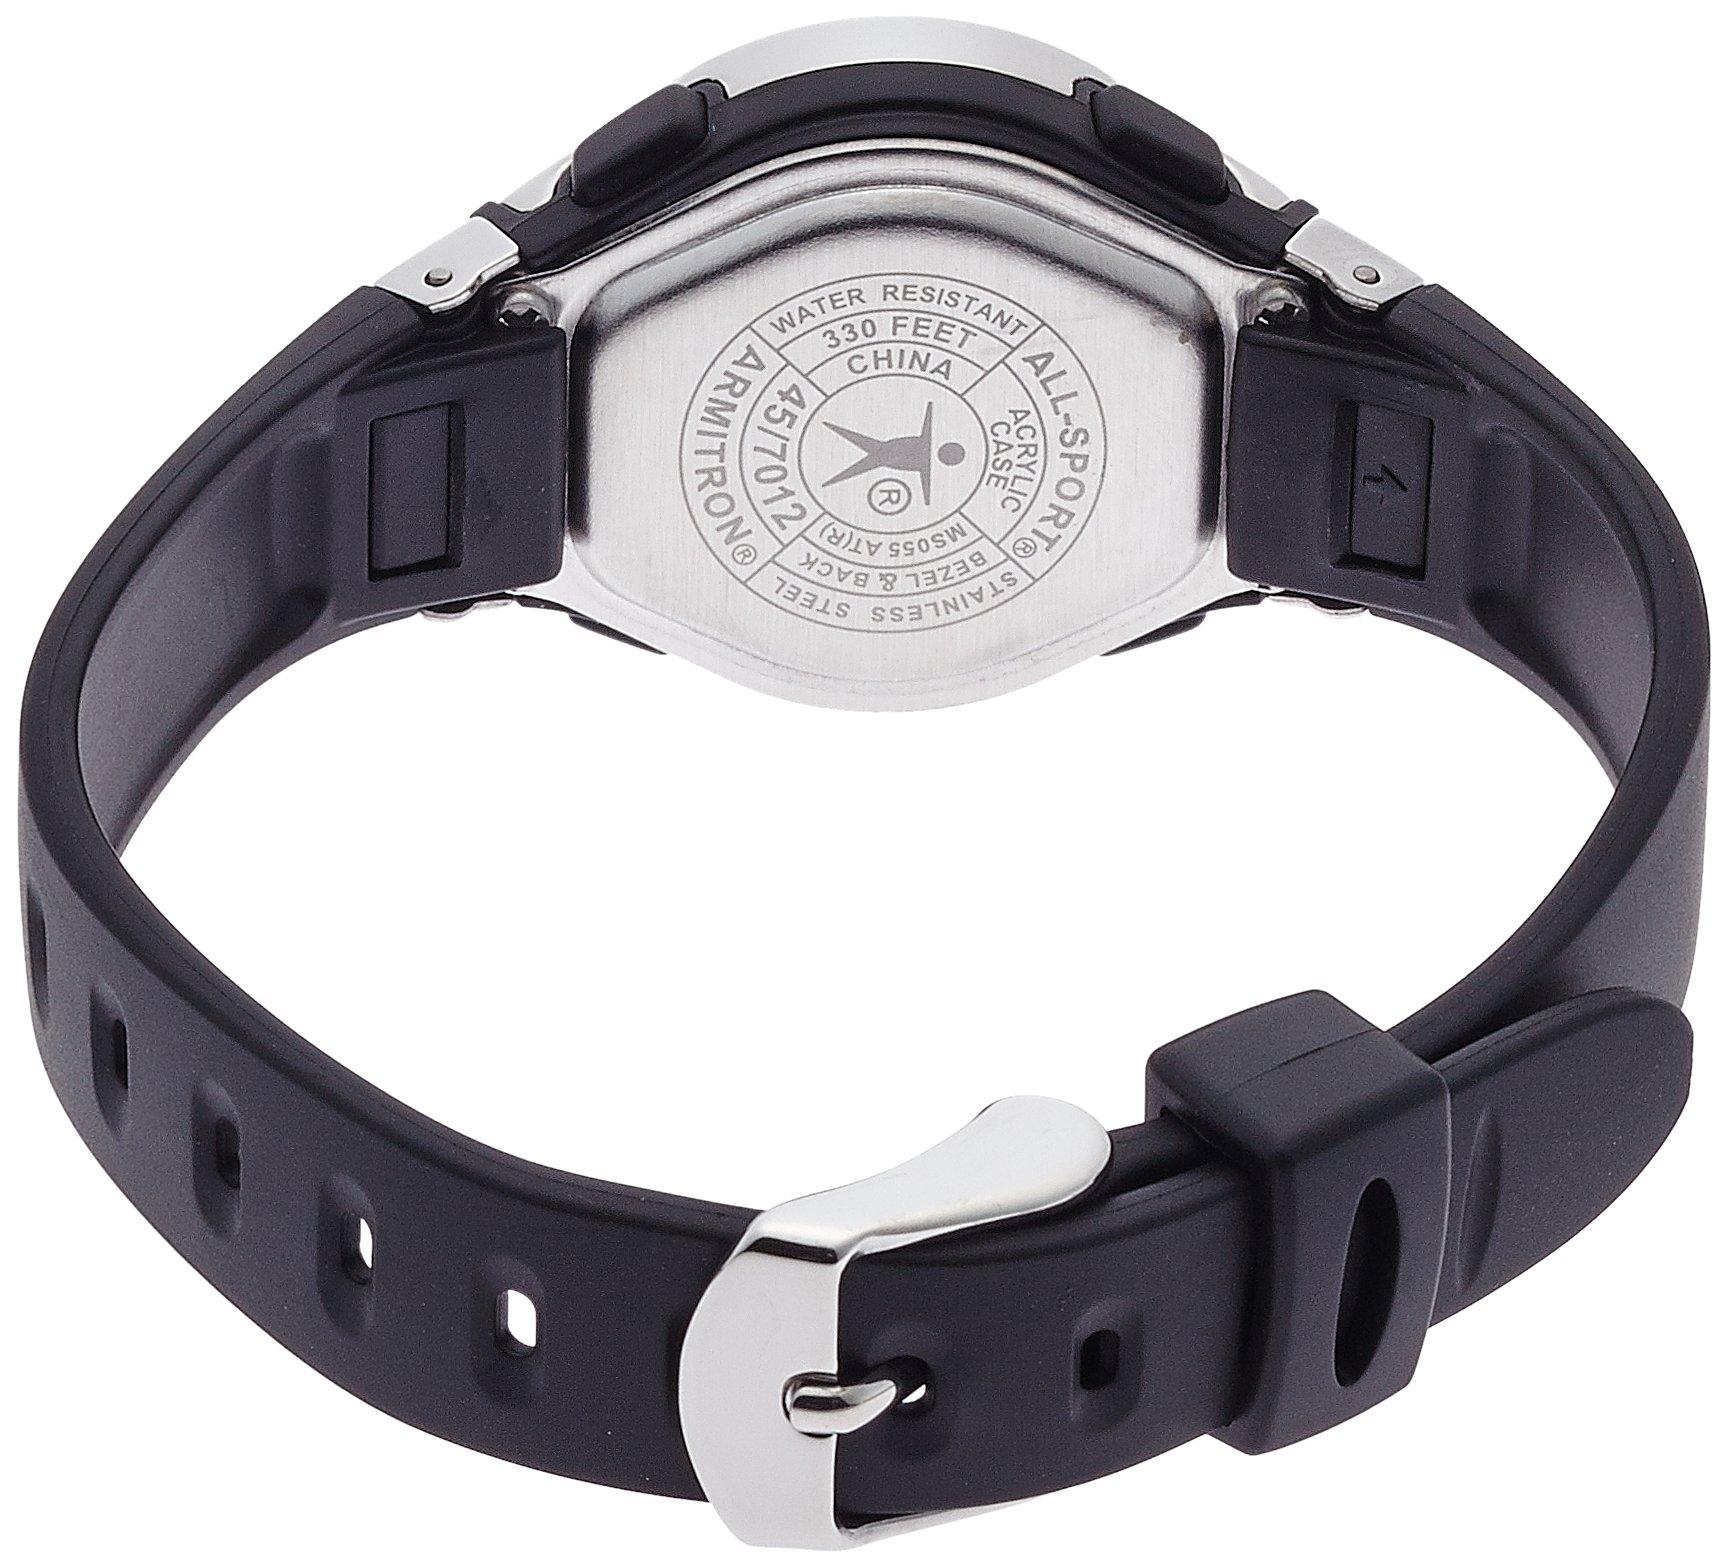 Original armitron sport women 457012blk chronograph black resin stainless steel ebay for Black resin ladies watch